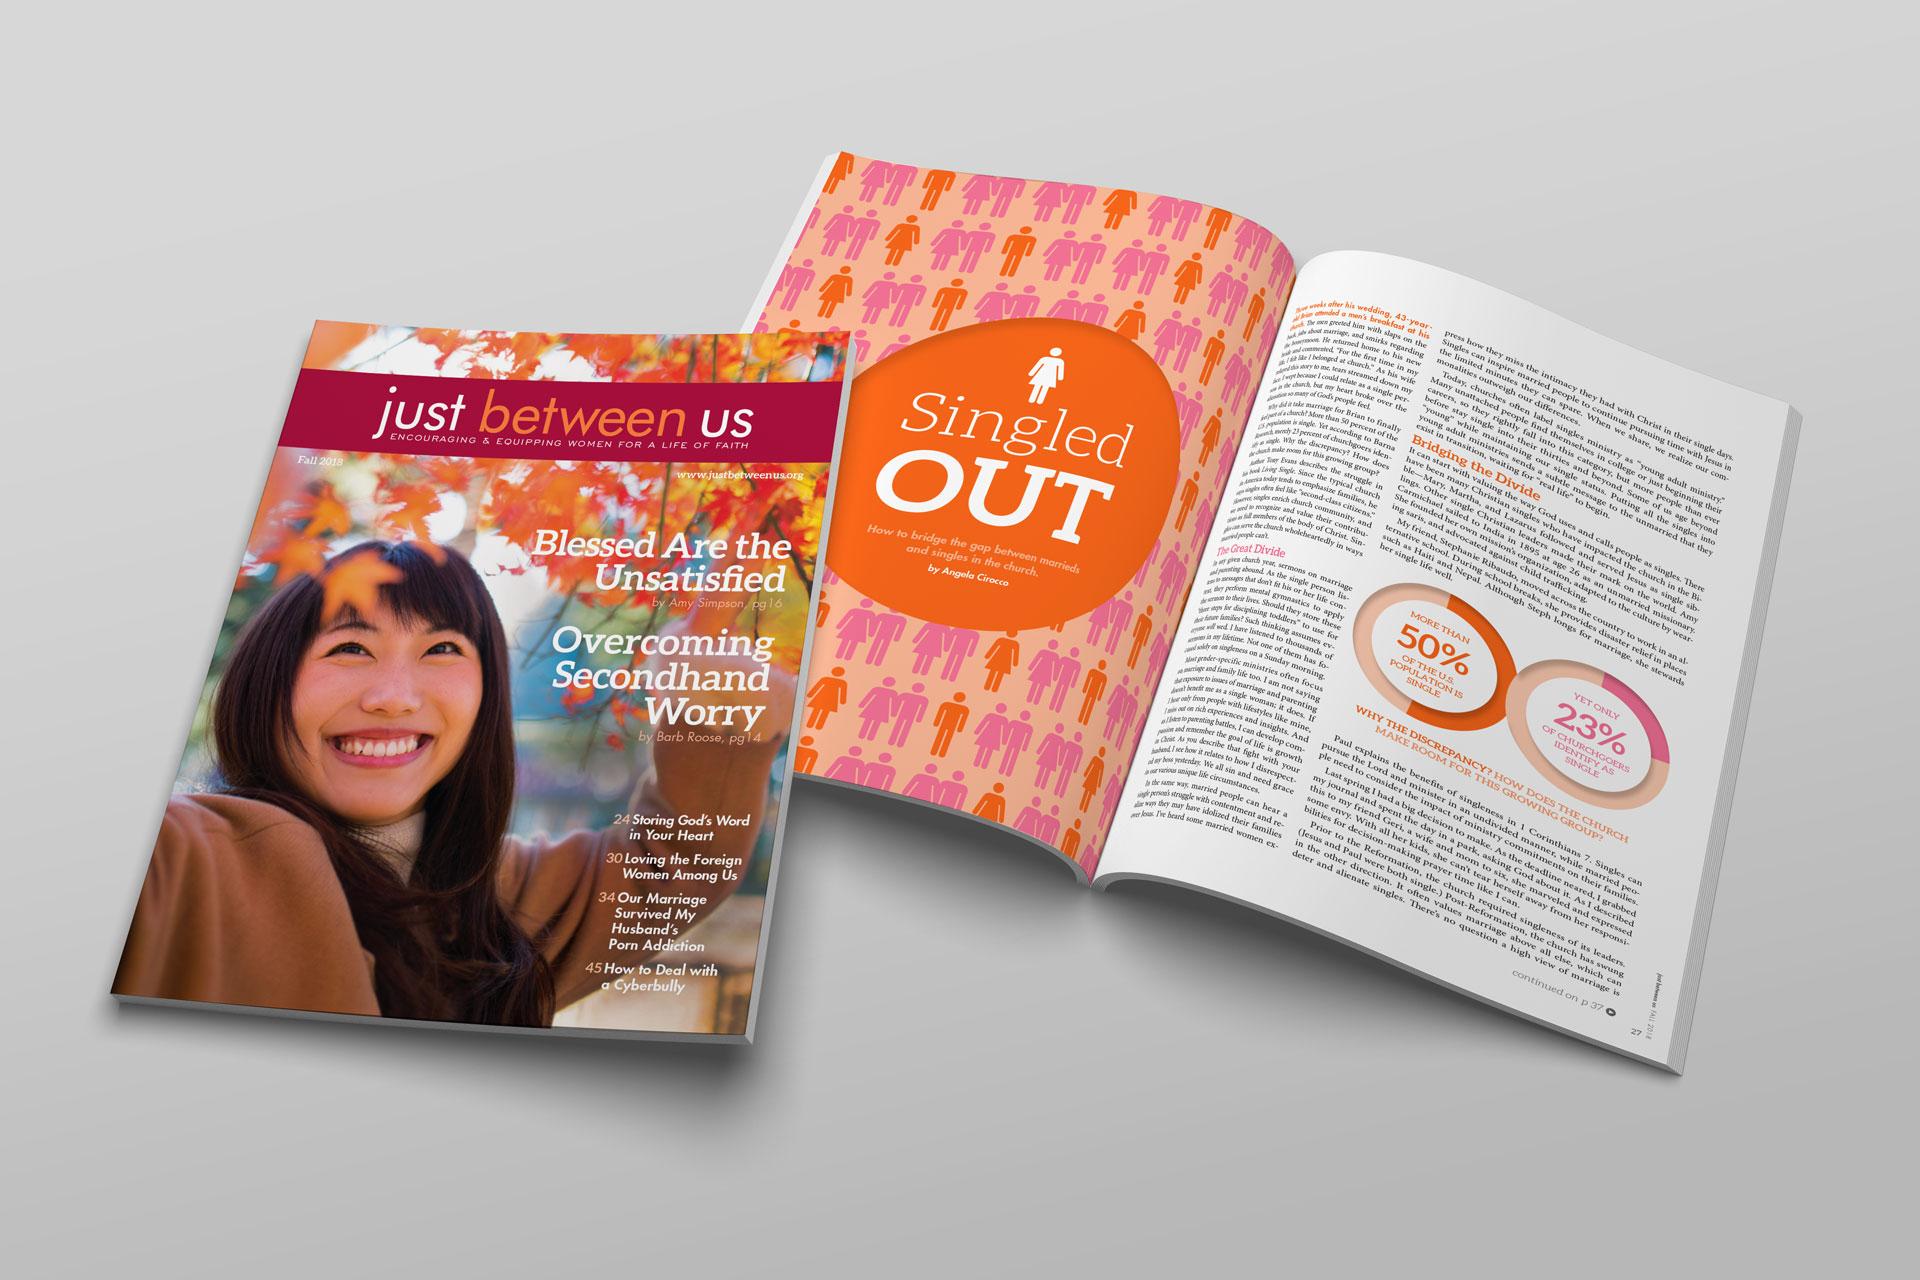 JBU-fall18-cover.jpg